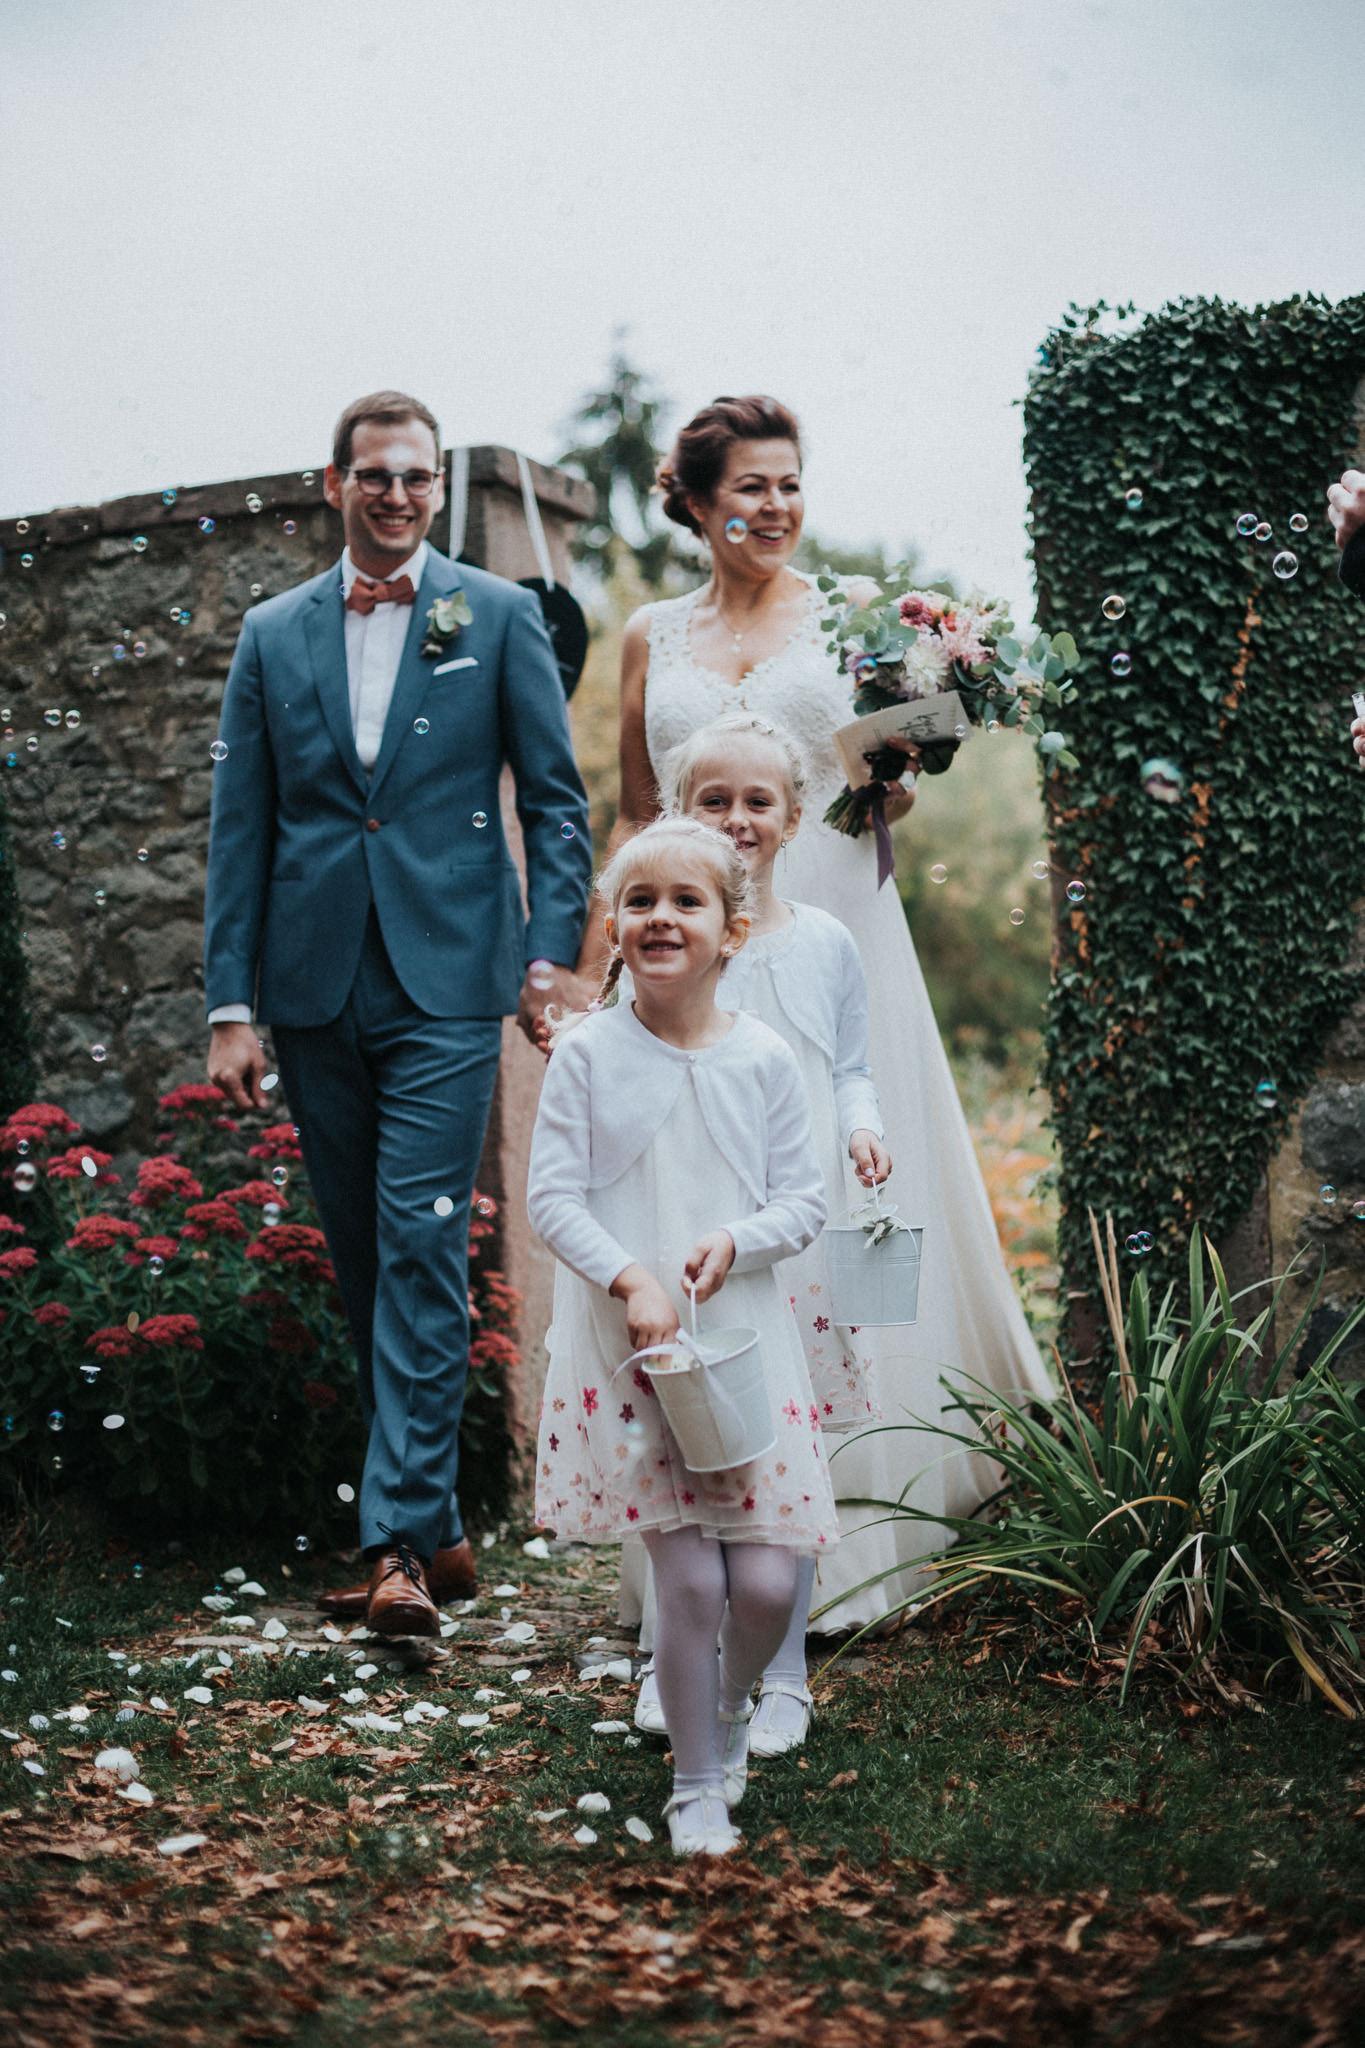 Hochzeitsfotograf-Homberg-37.jpg